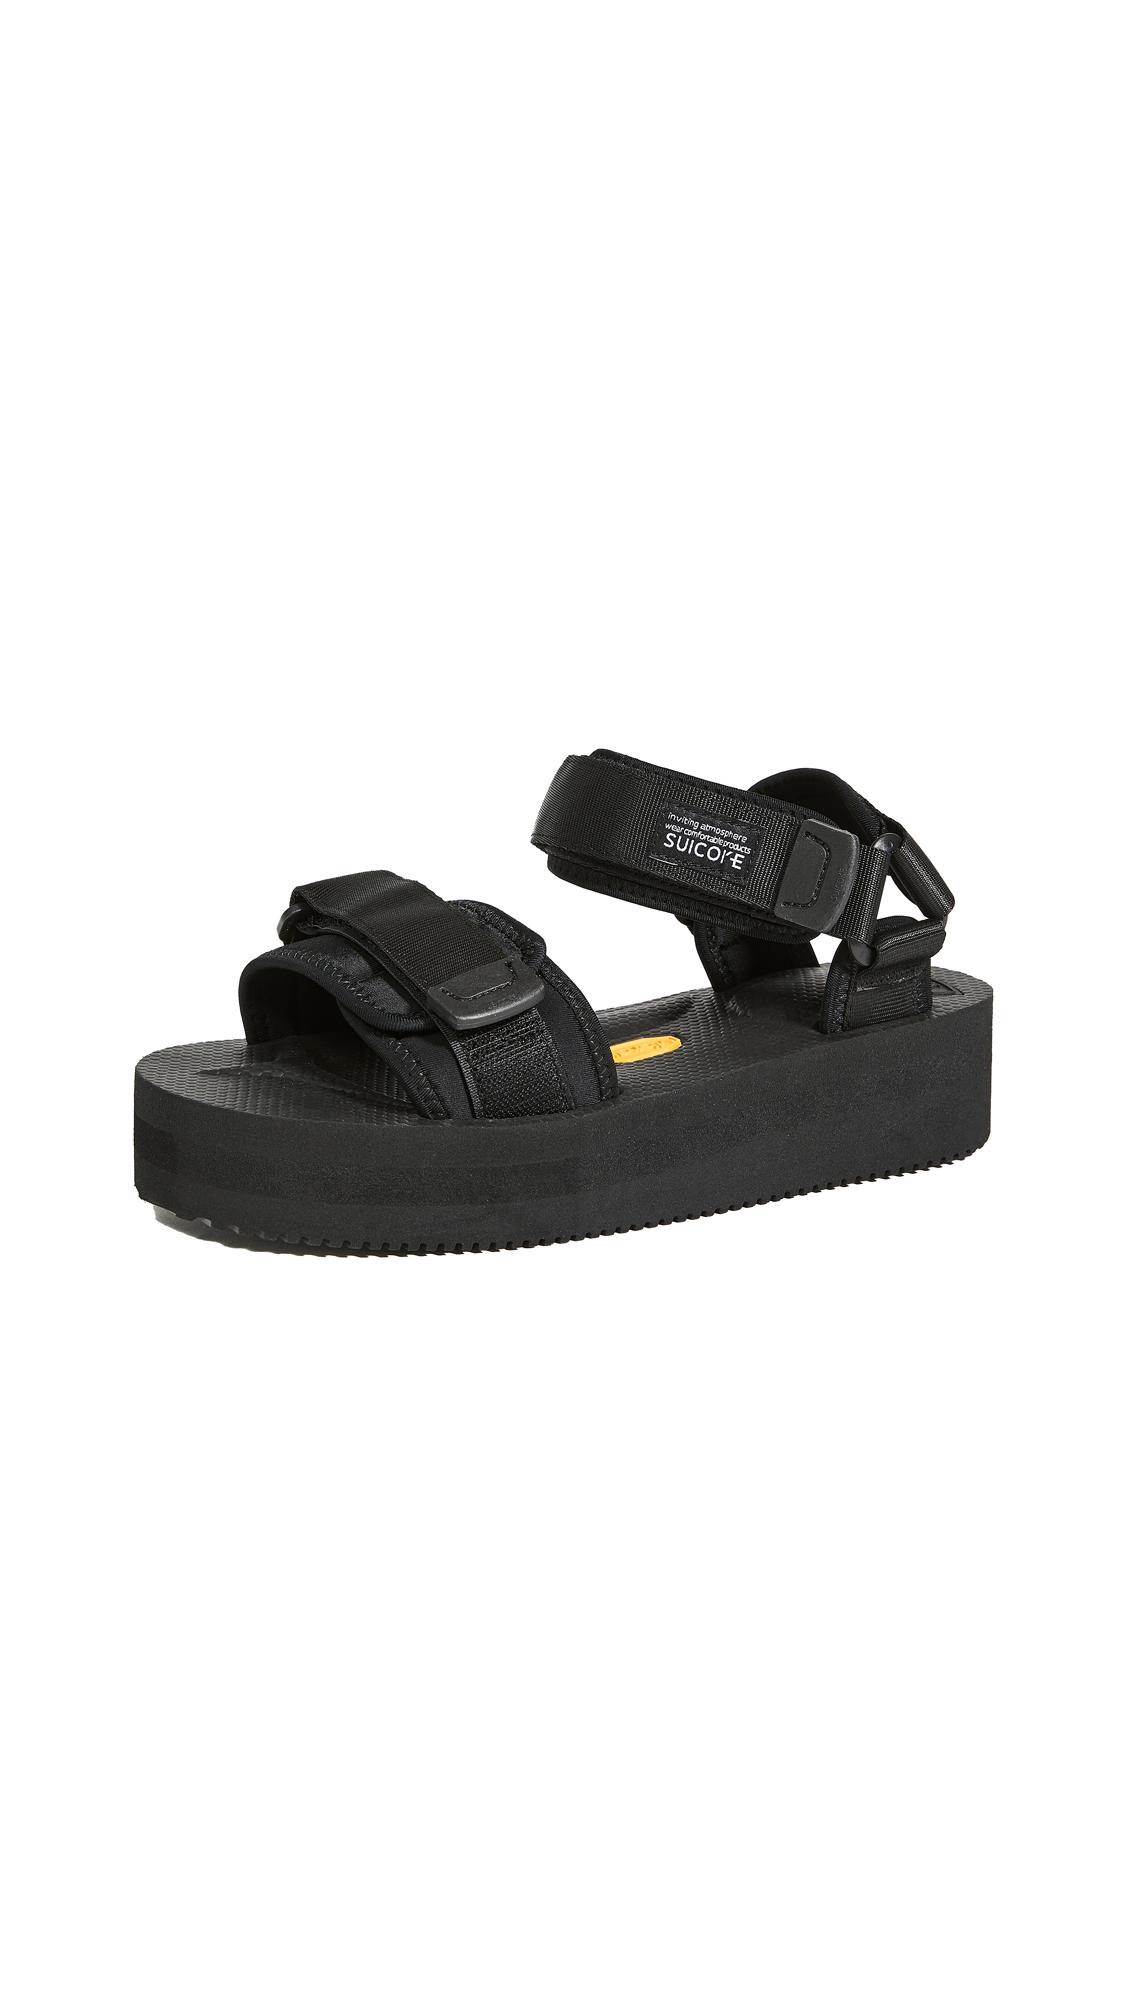 Buy Suicoke Cel-VPO Sandals online, shop Suicoke